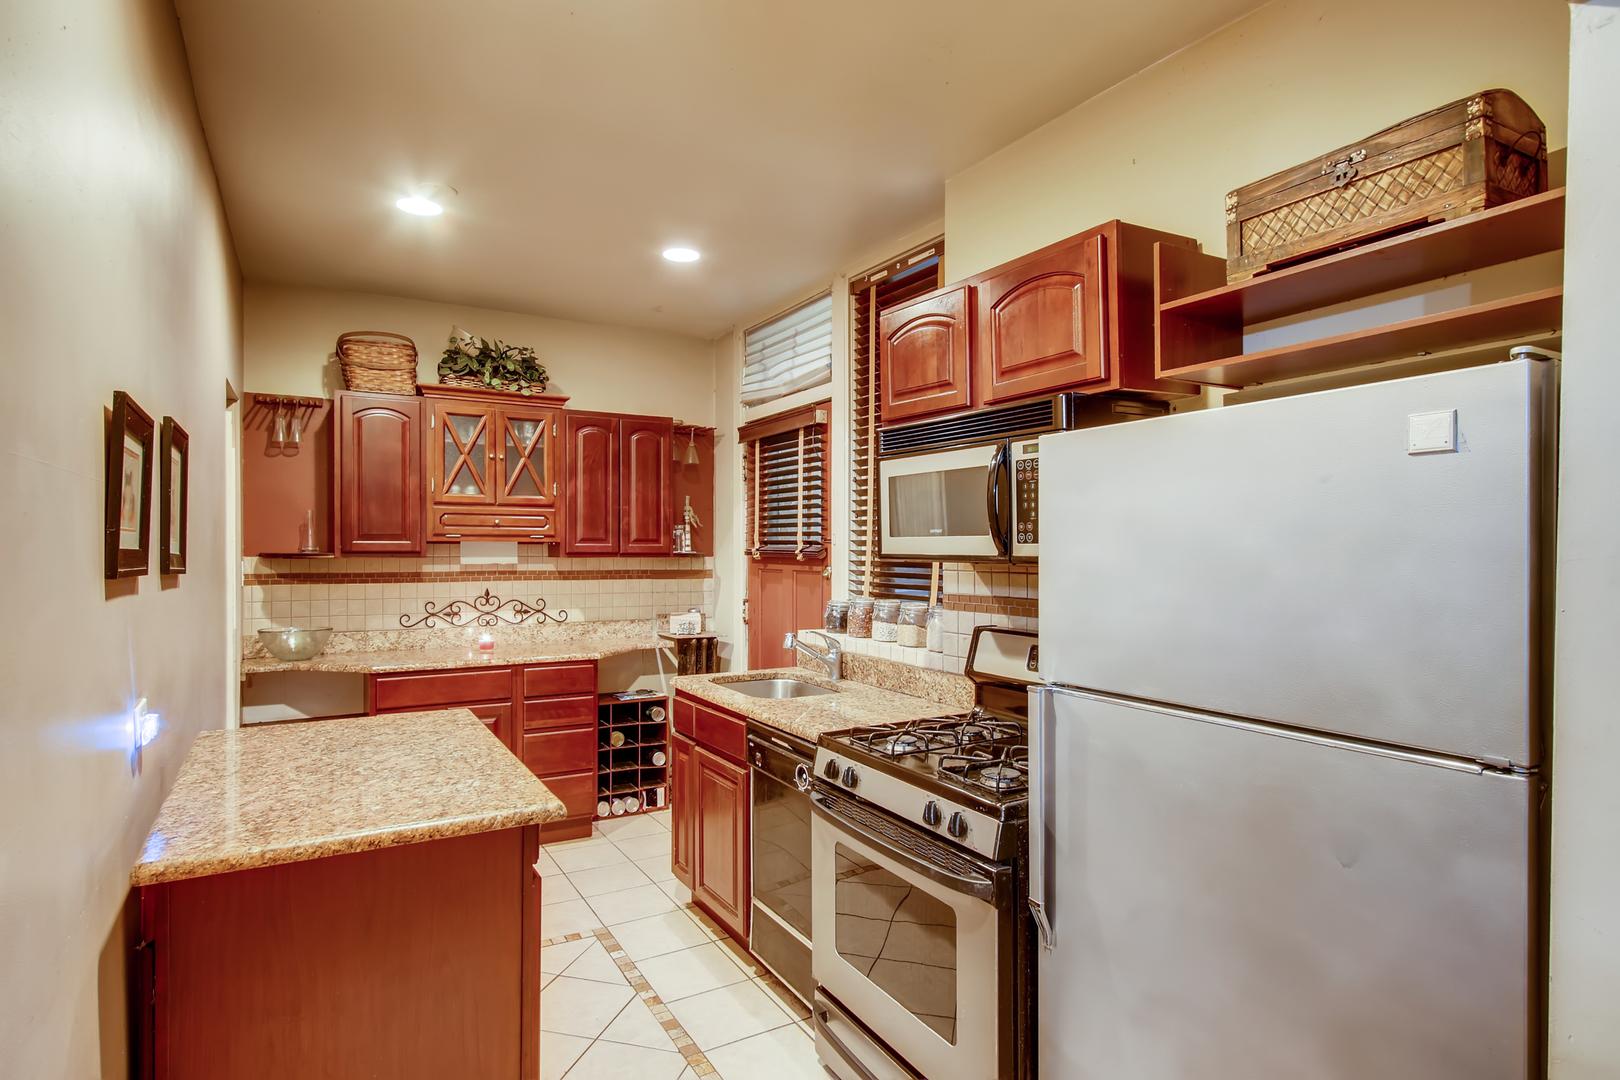 Hd 1574895338587 601 w fullerton parkway print 010 009 kitchen 3600x2400 300dpi